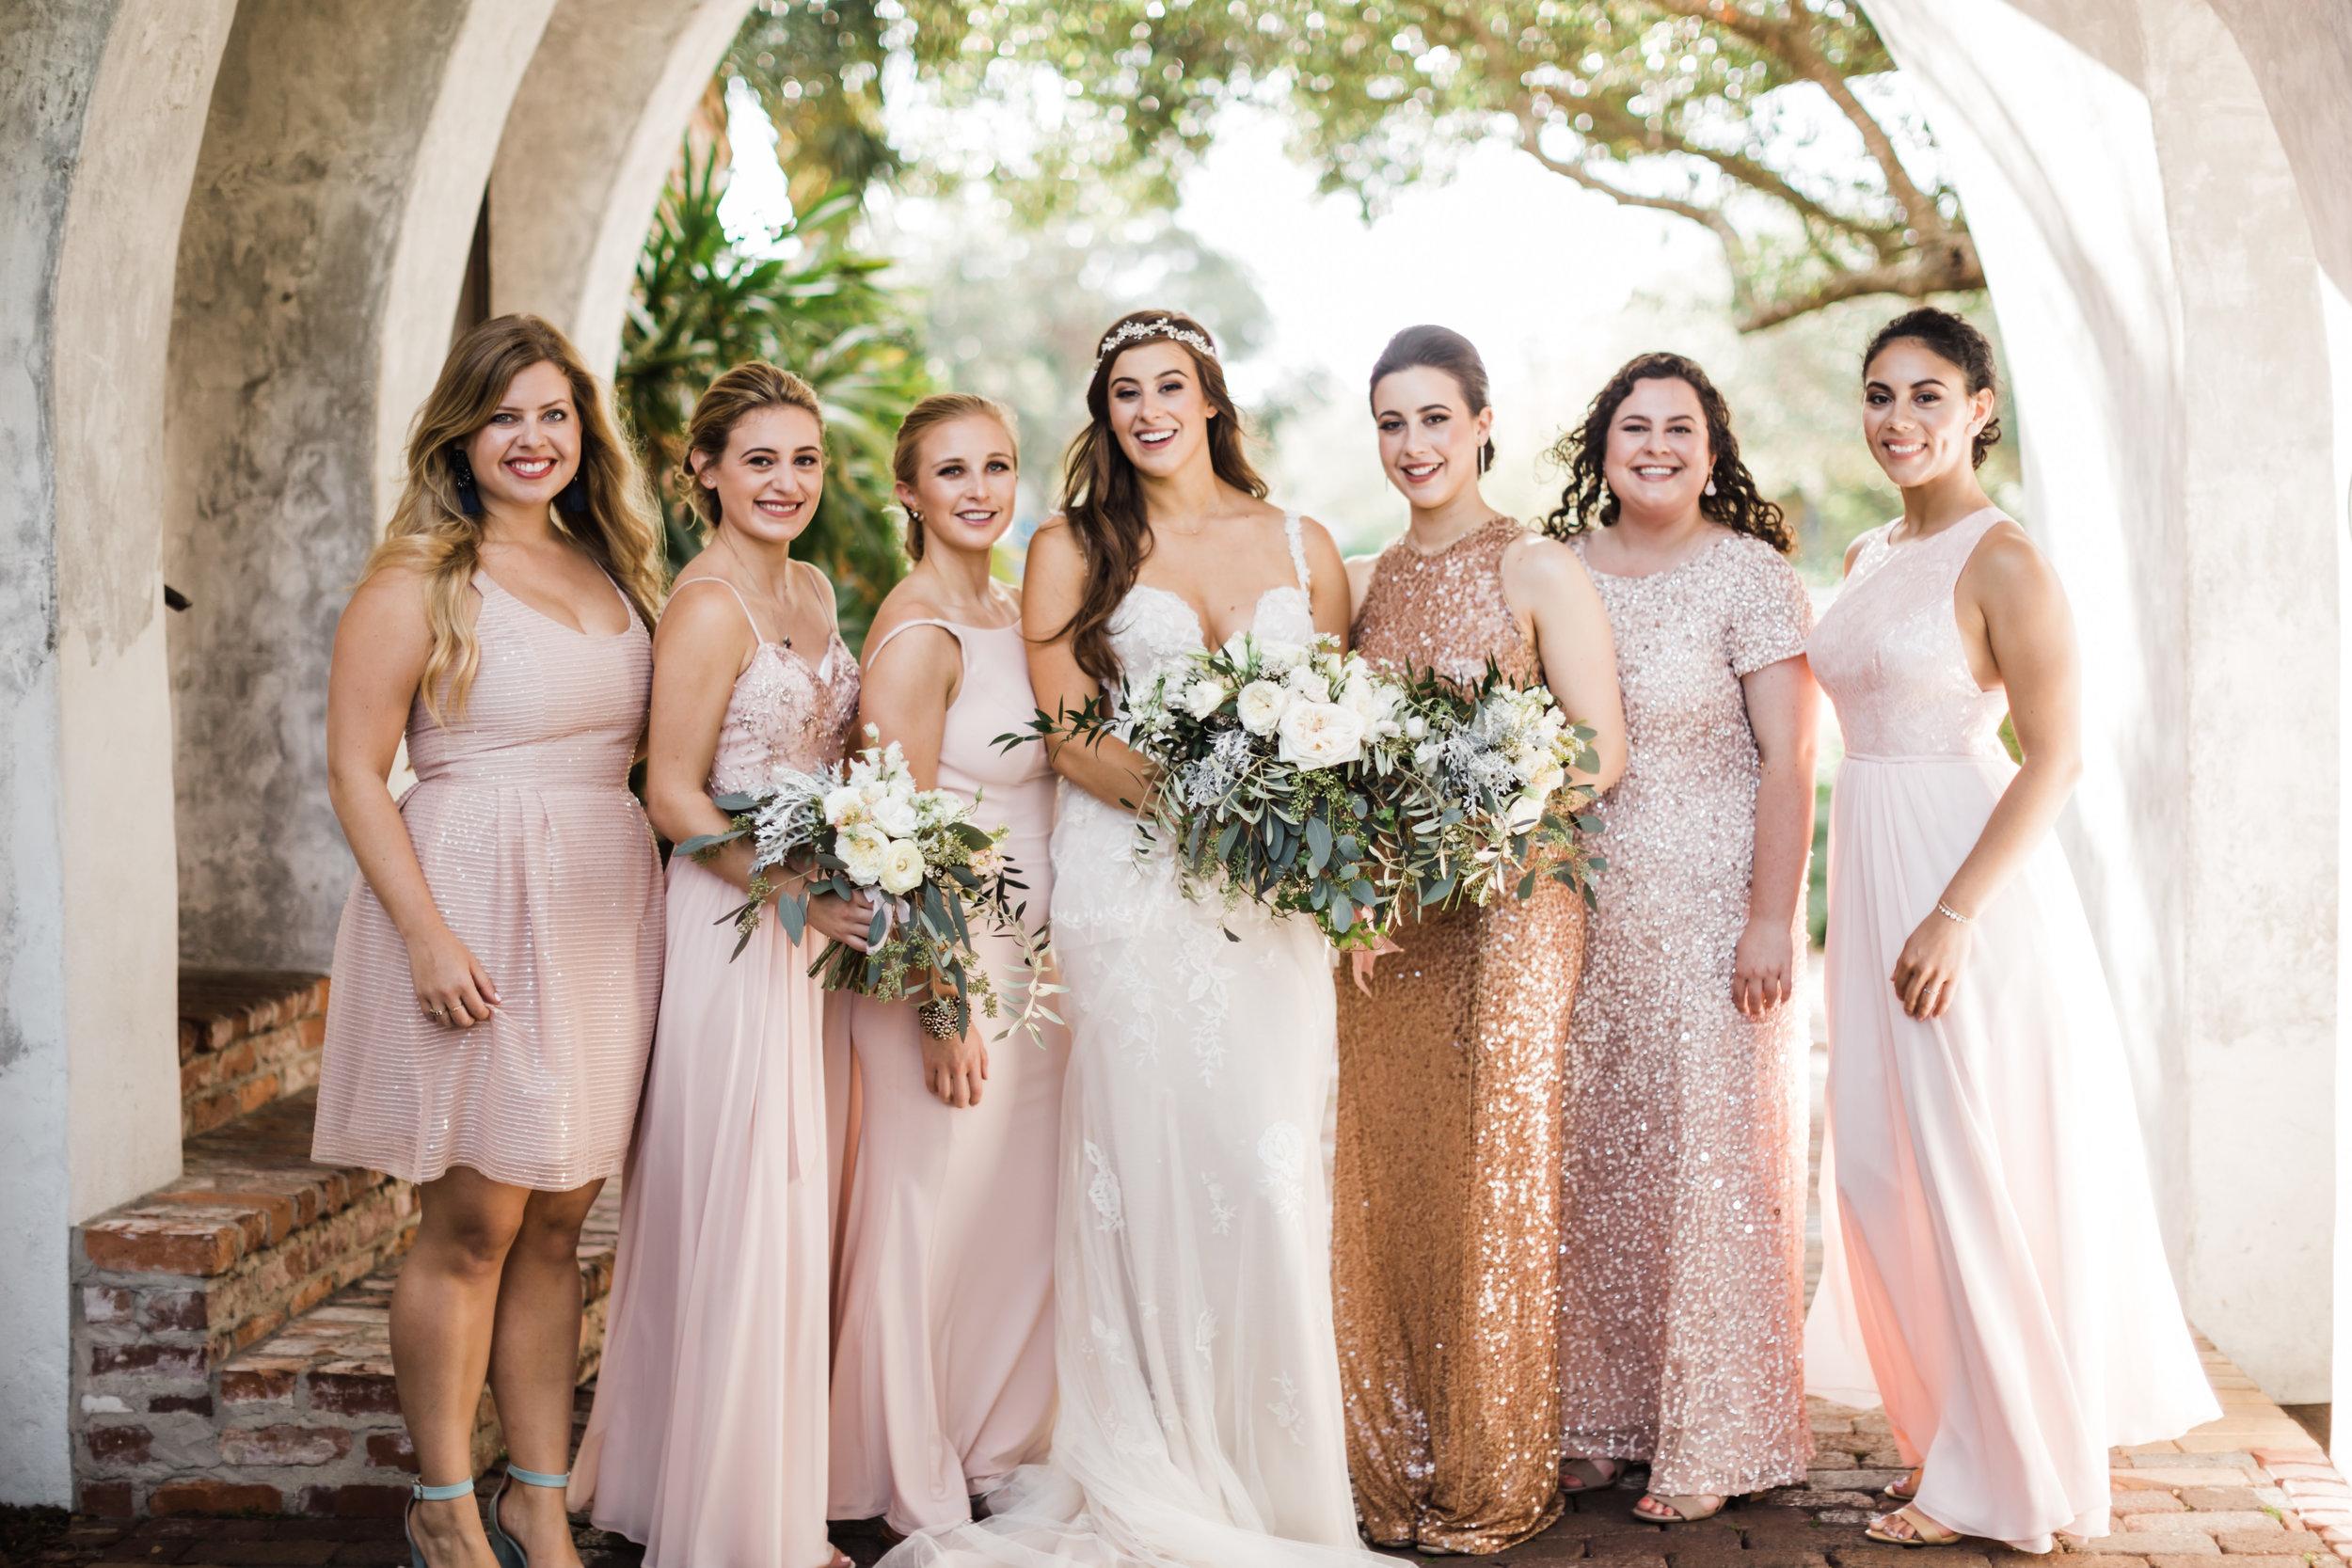 2017.10.15 Steffi and Elliott Simmonds Casa Feliz Wedding (280 of 969).jpg